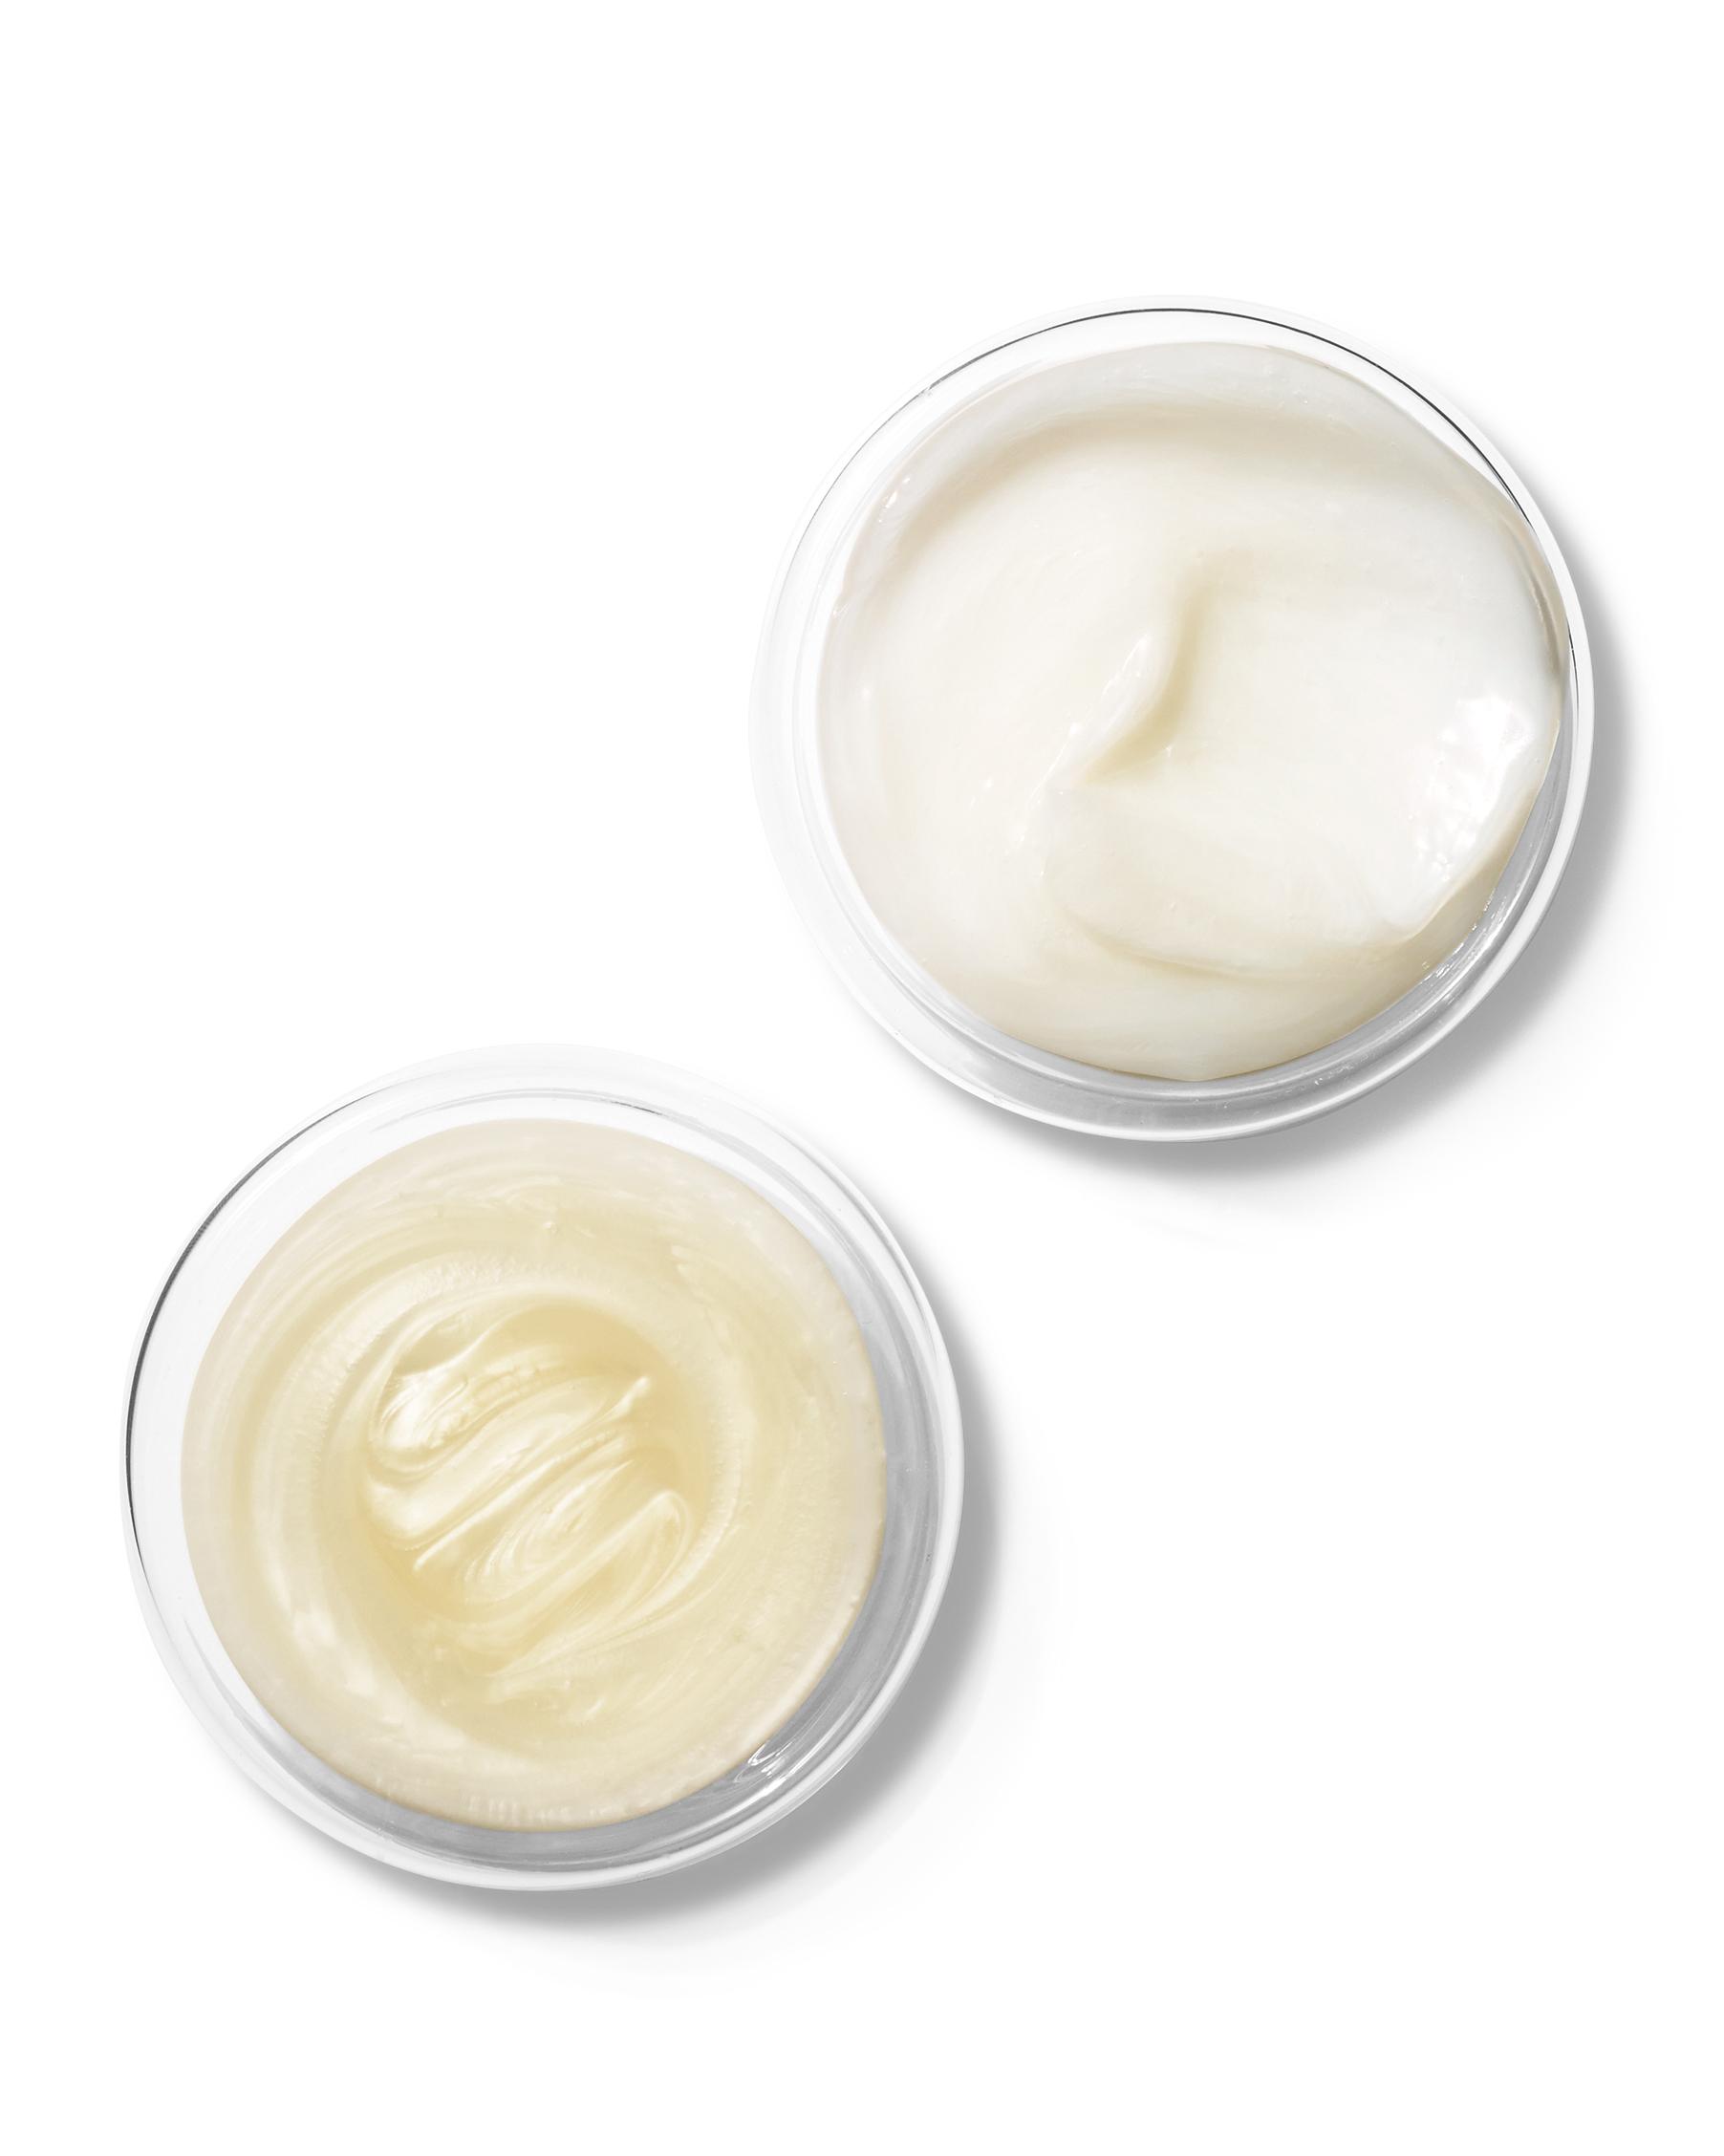 shampoo-conditioner-4-237-d111715.jpg